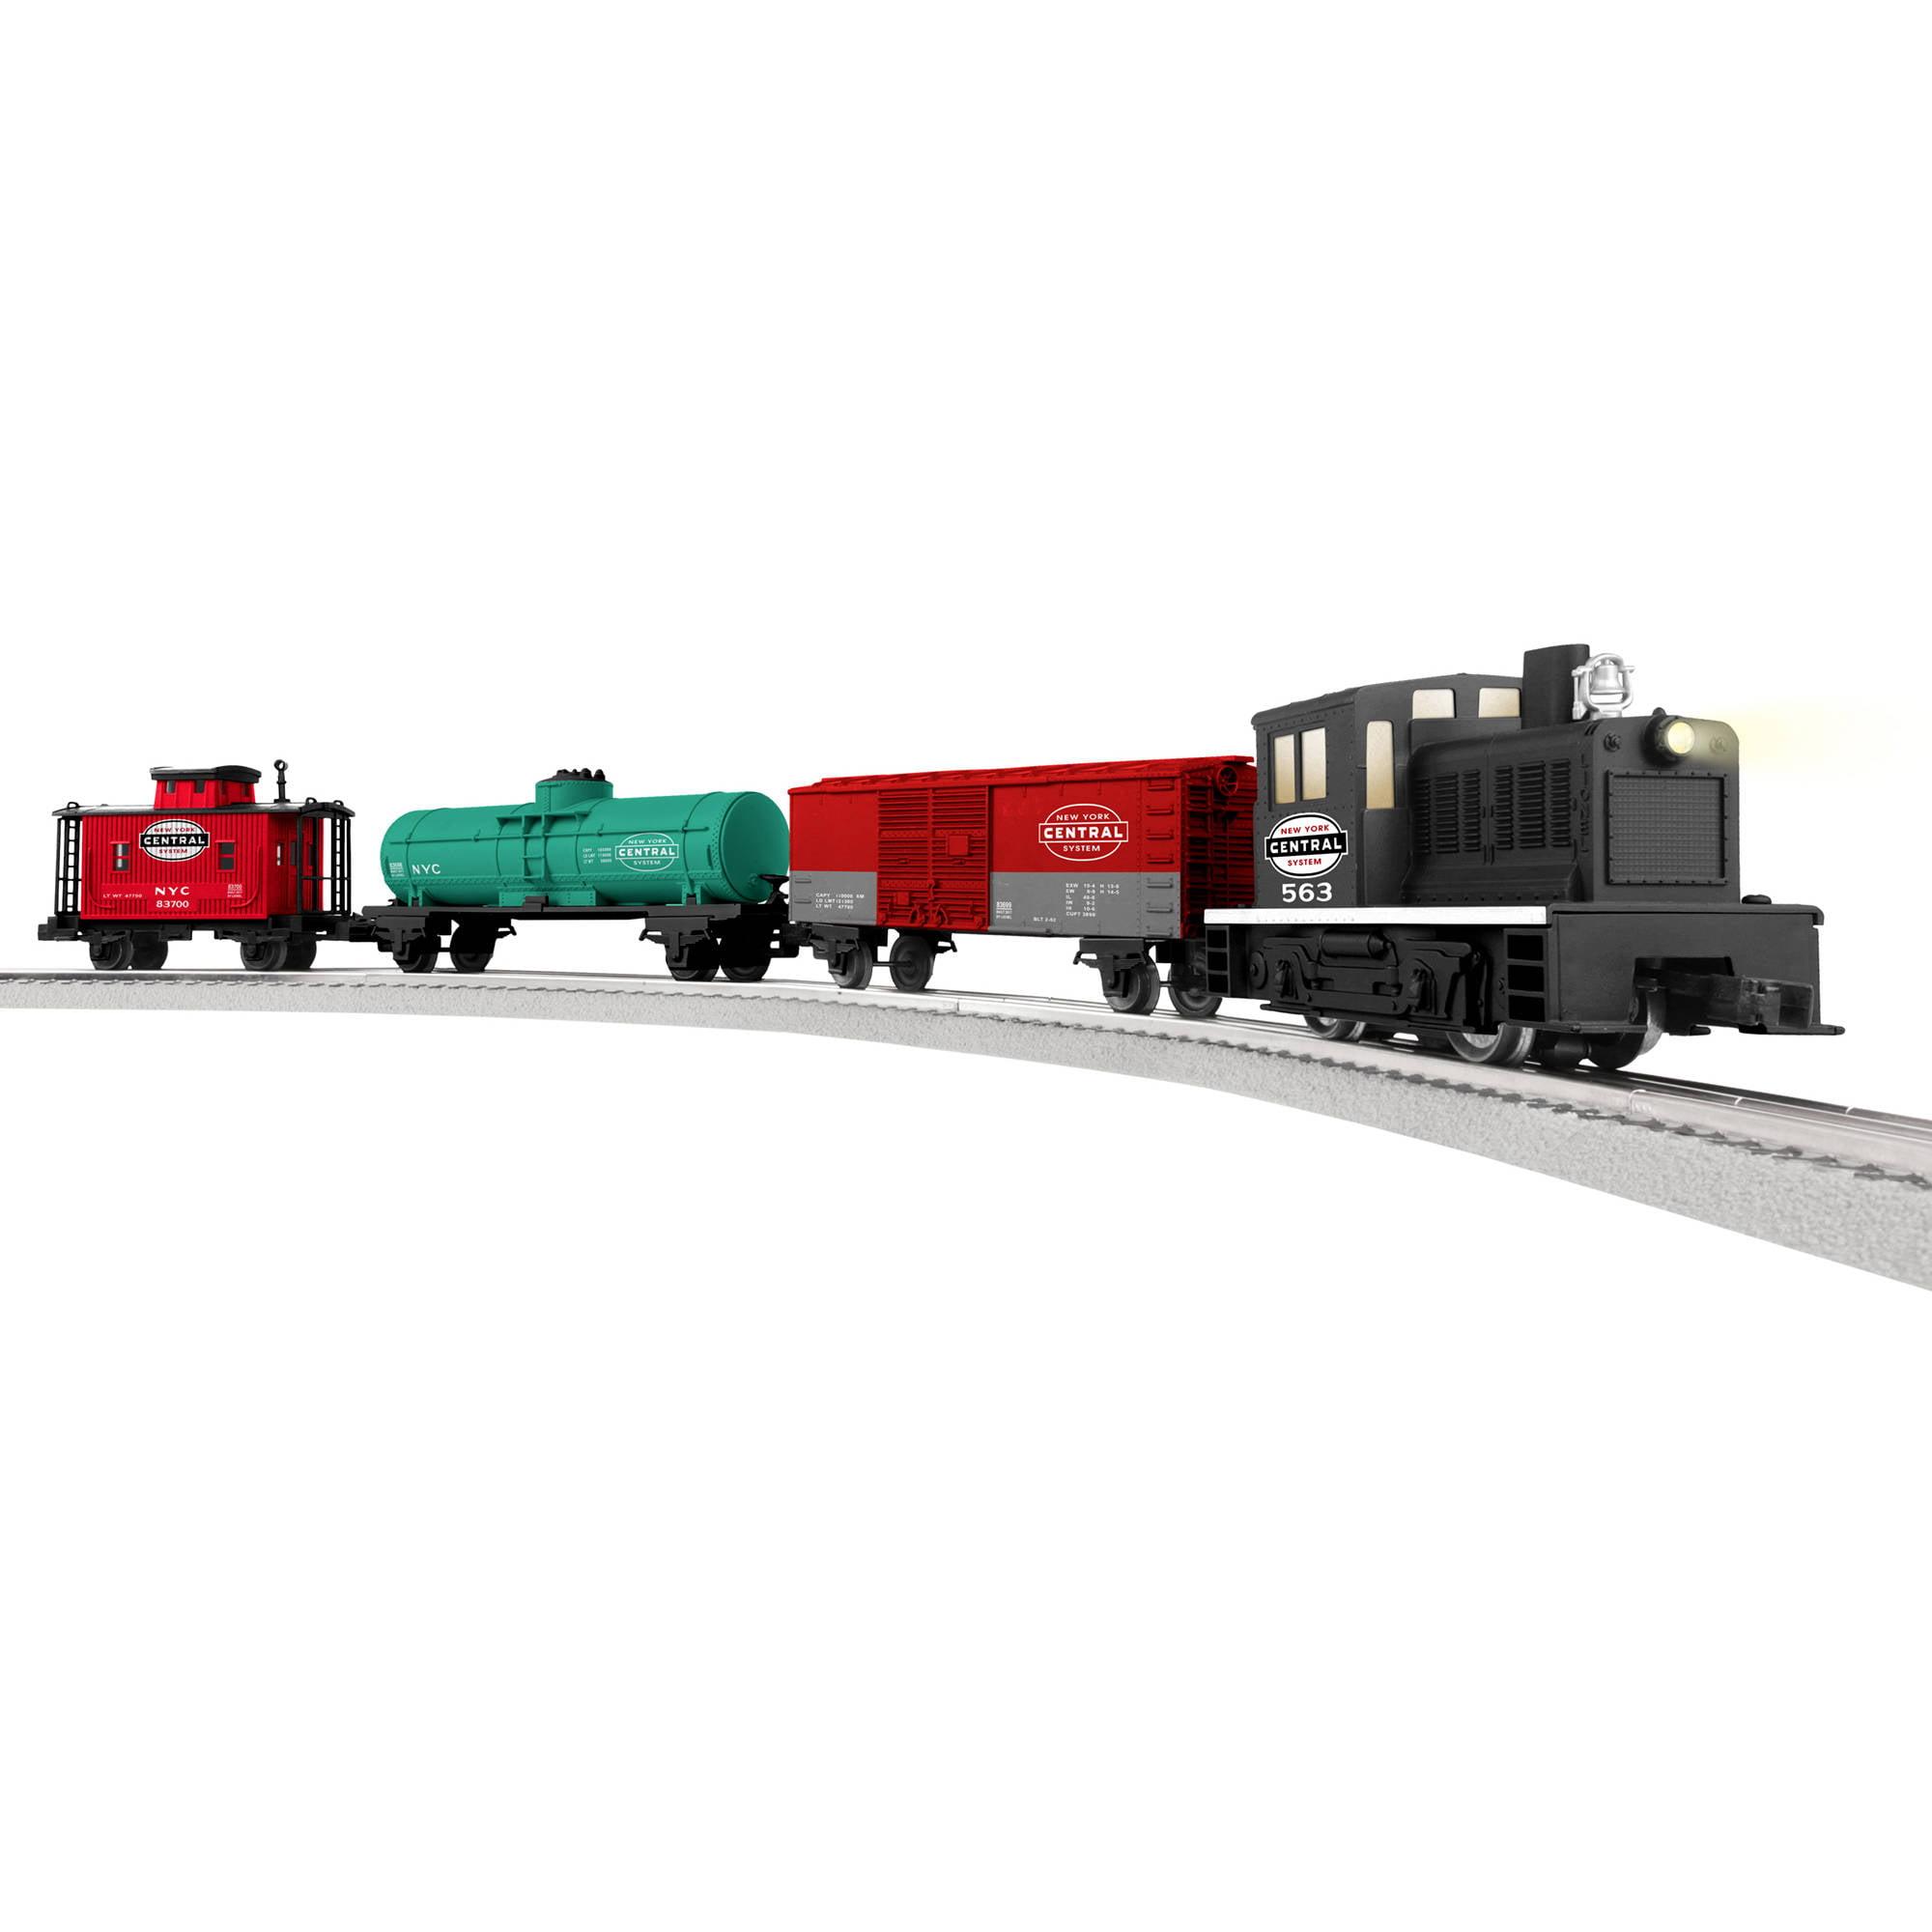 Lionel Trains Junction New York City Pacemaker Diesel Remote Control Train Set by Lionel, LLC